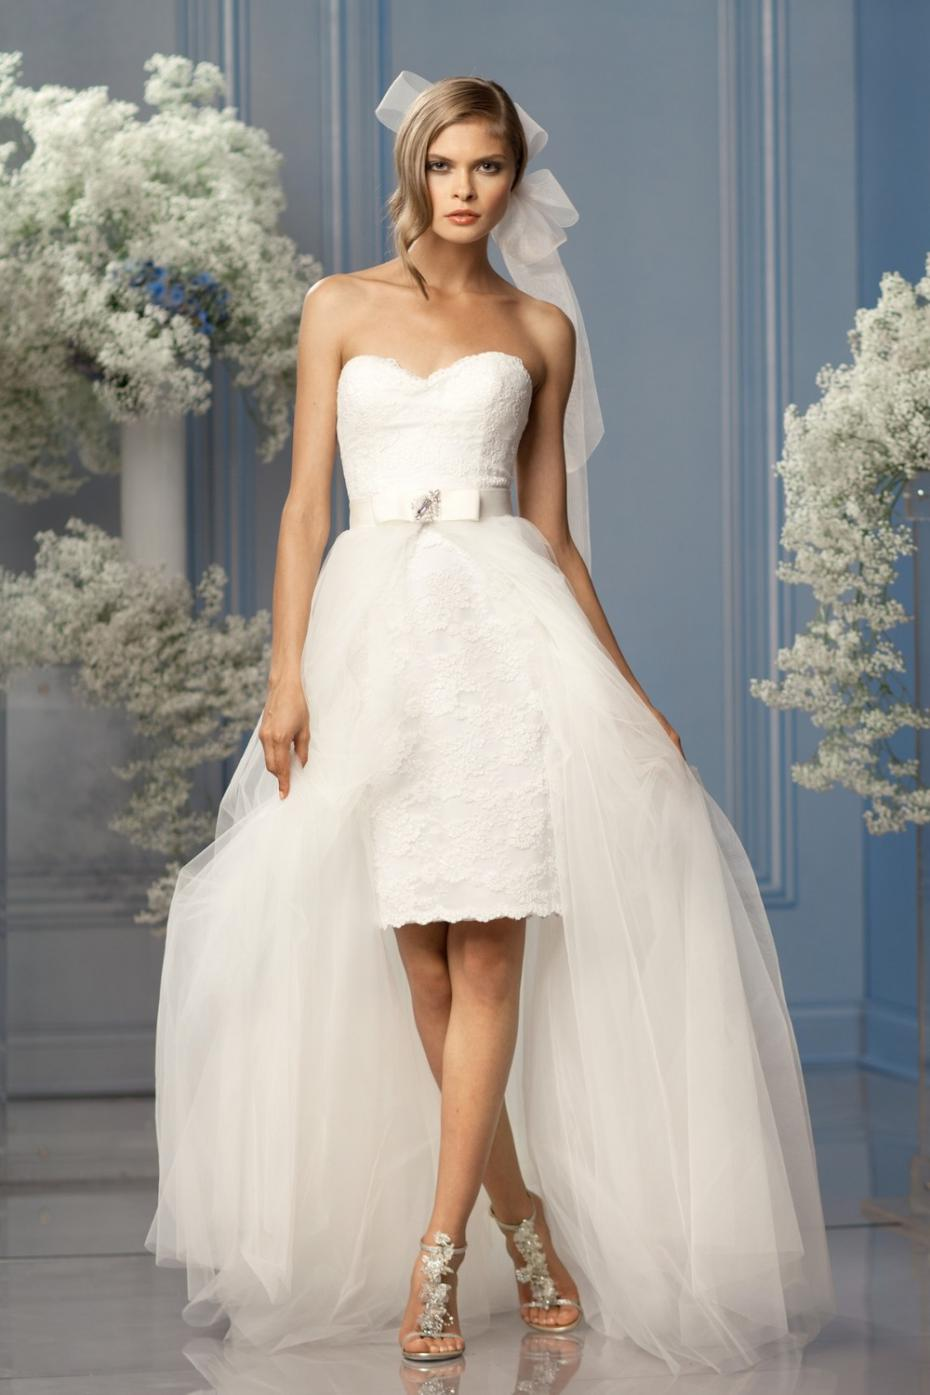 Sweetheart Liques A Line Lace High Low Wedding Dresses Removable Skirt 2 In 1 Gelinlik 2017 Vestido De Noiva Cetim Julie Vino From